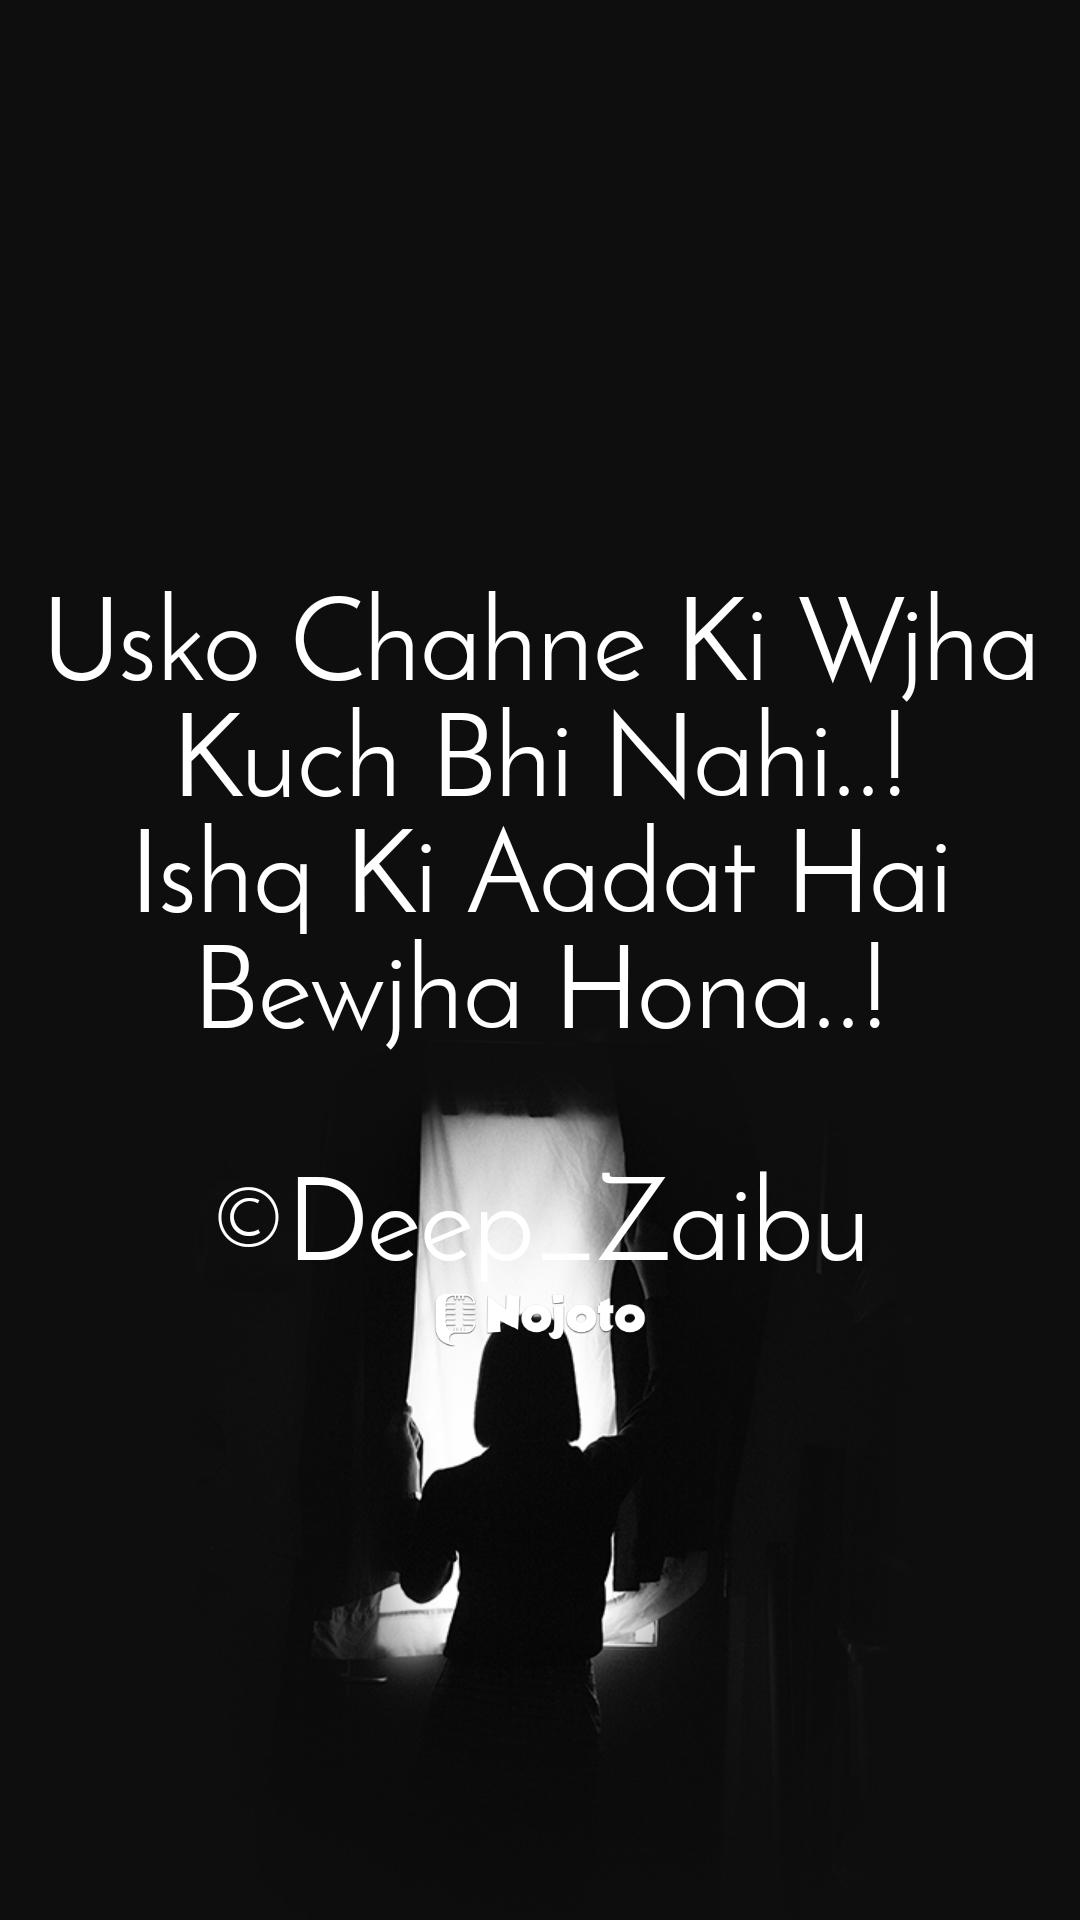 Usko Chahne Ki Wjha Kuch Bhi Nahi..! Ishq Ki Aadat Hai Bewjha Hona..!  ©Deep_Zaibu